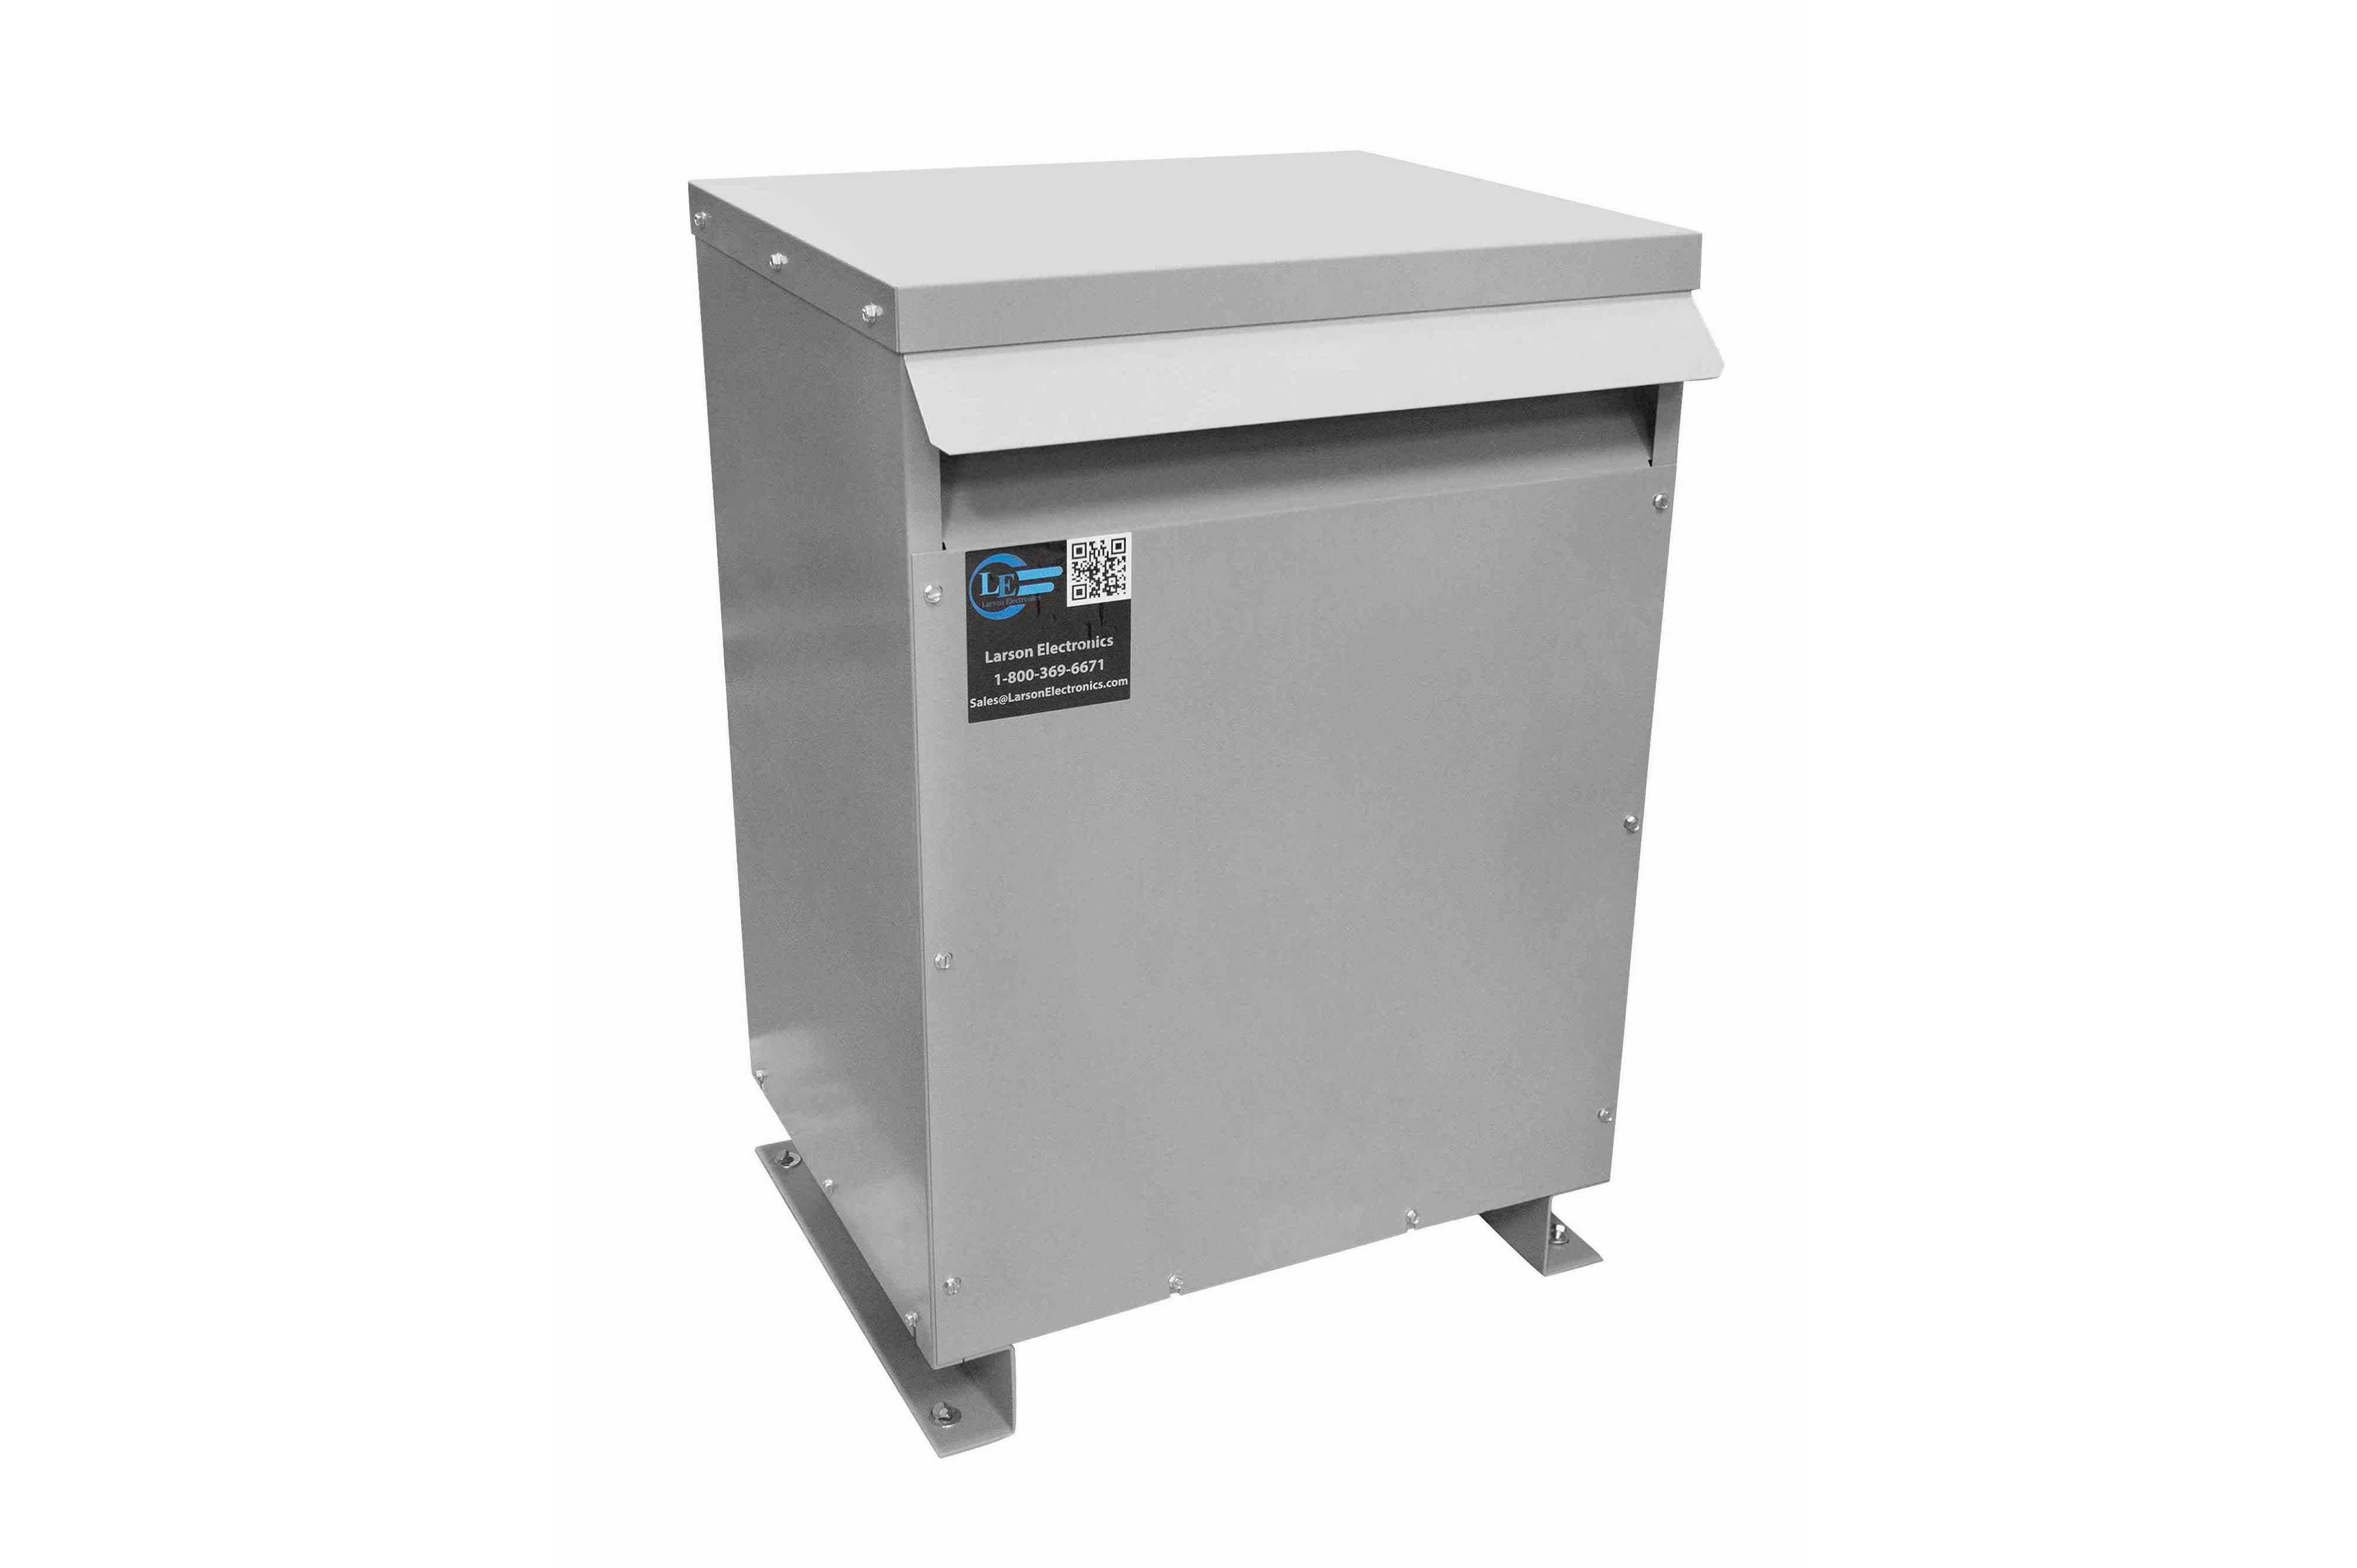 26 kVA 3PH Isolation Transformer, 575V Wye Primary, 380Y/220 Wye-N Secondary, N3R, Ventilated, 60 Hz